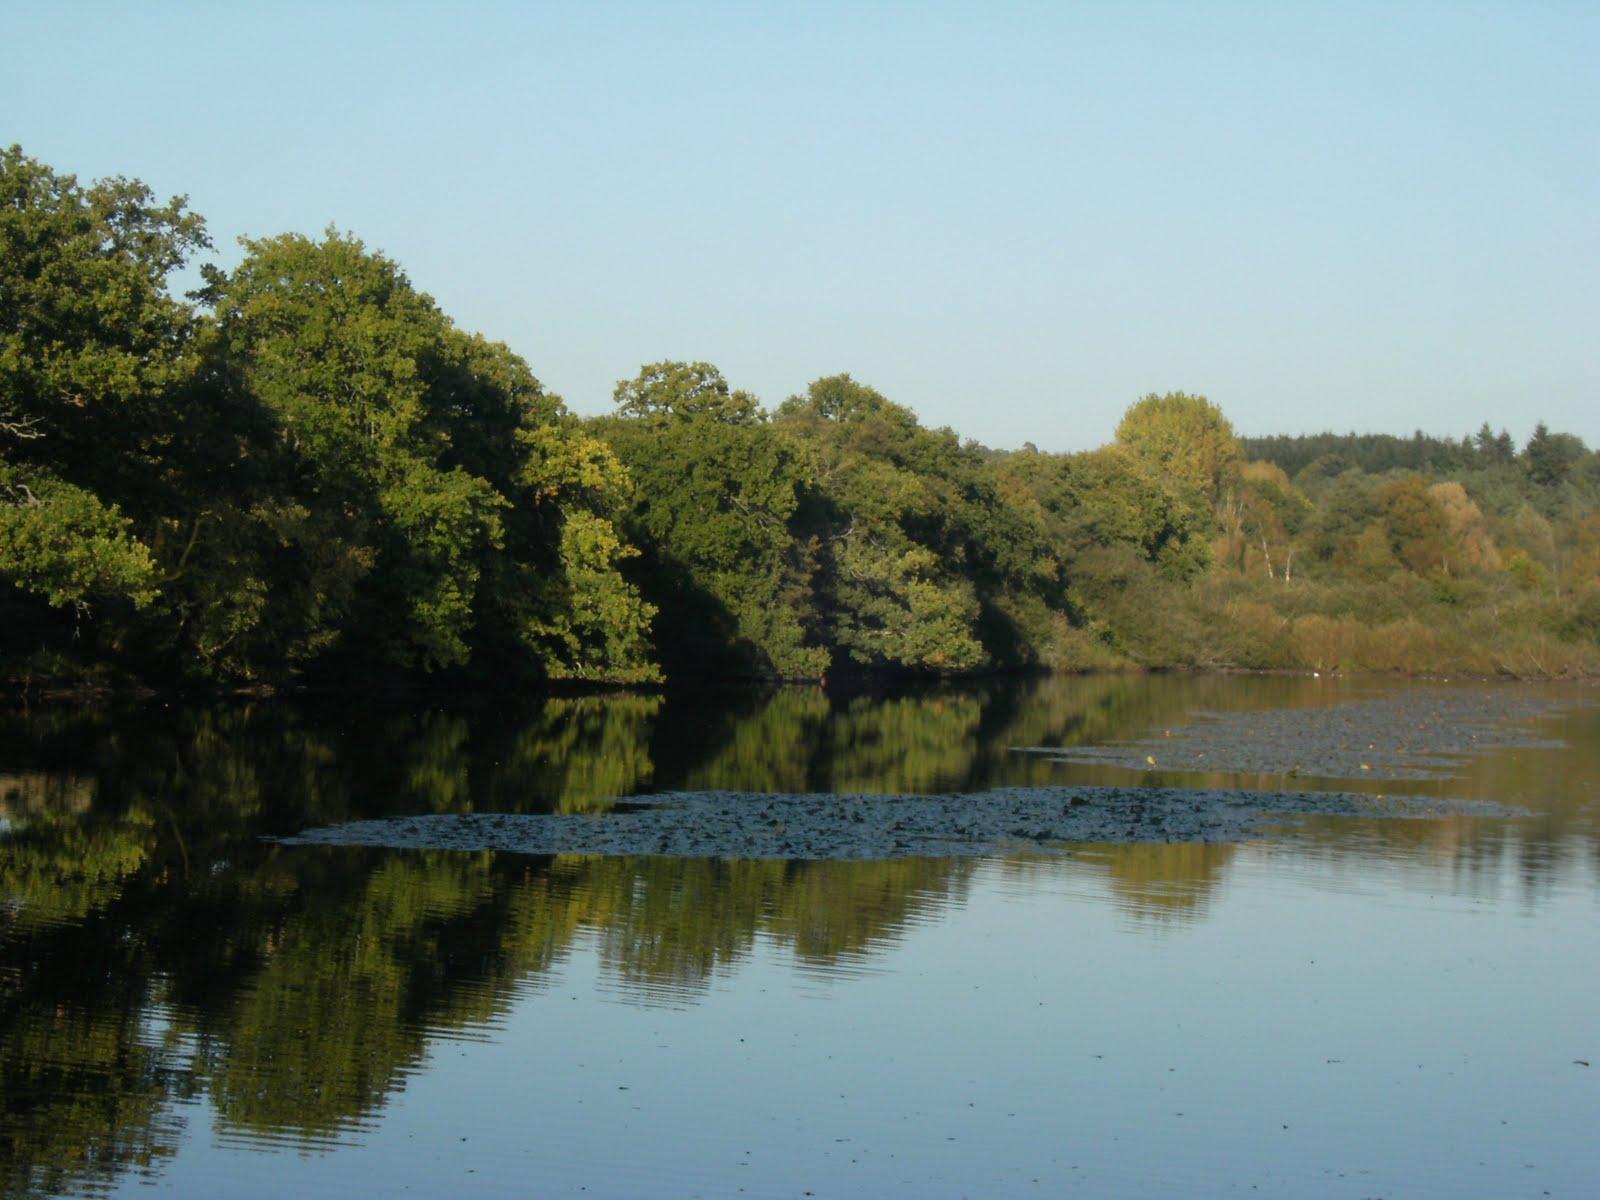 DSCF0029 Broadhurst Lake